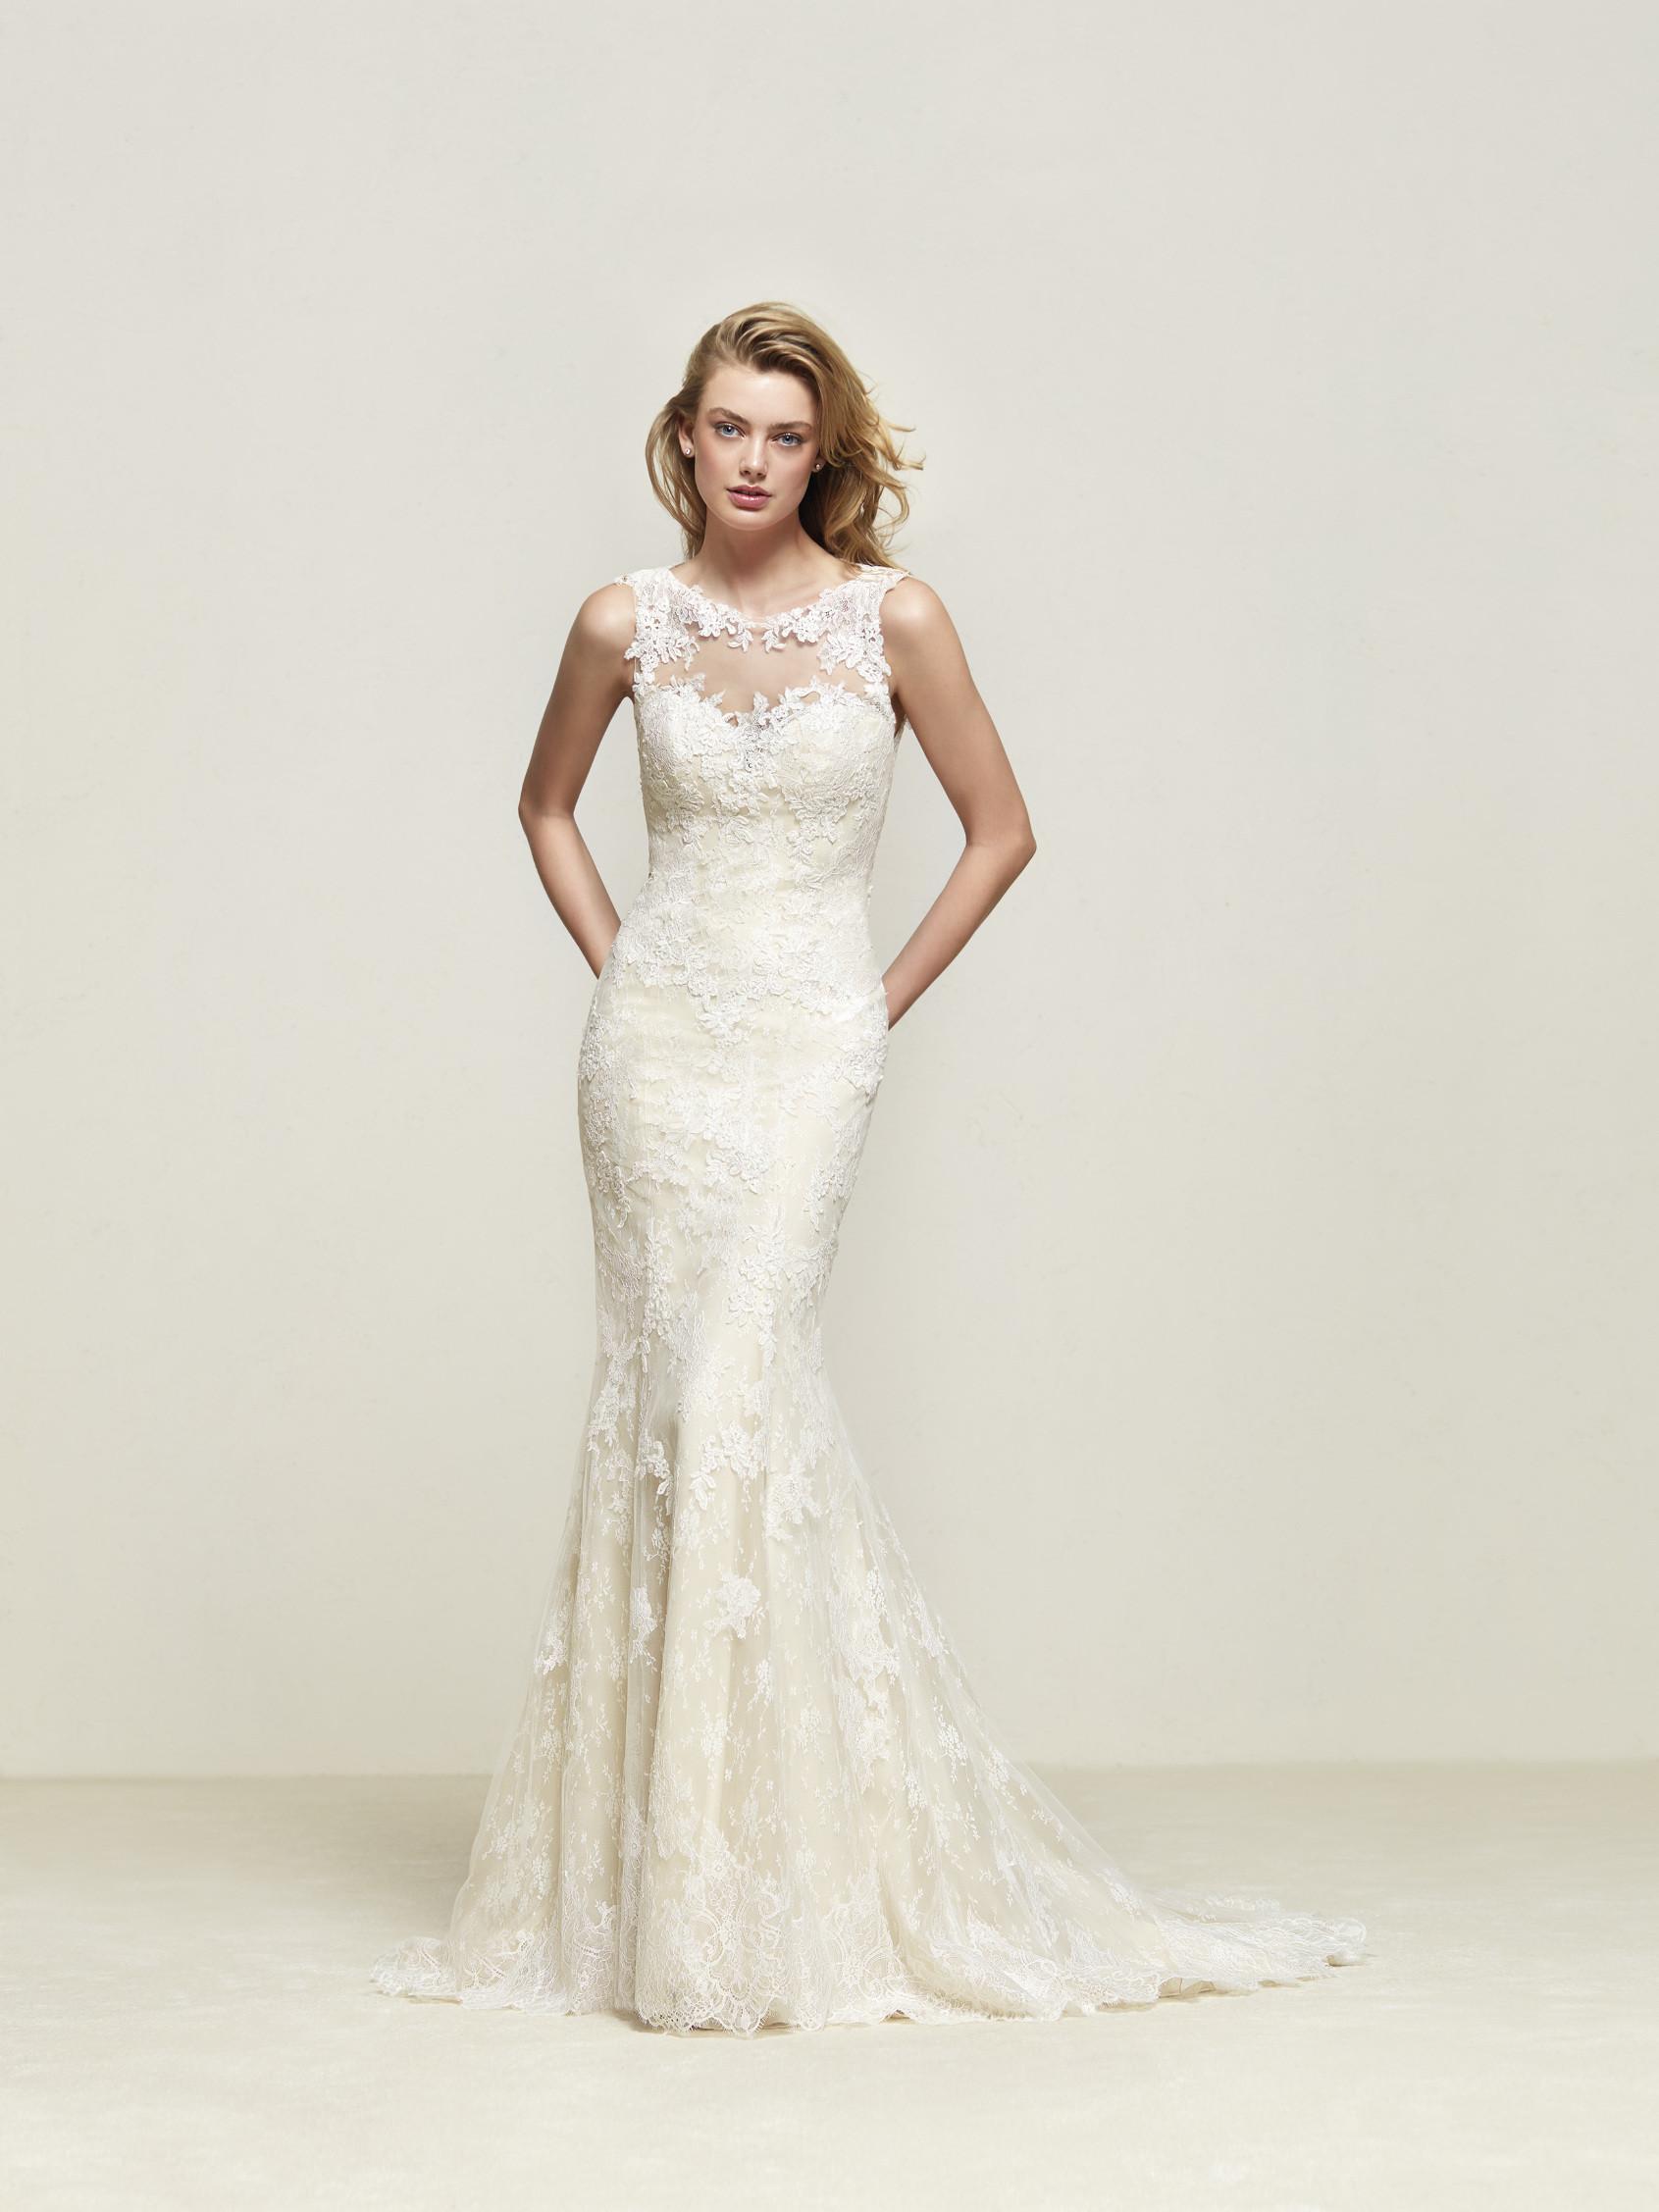 Oriental Wedding Dress 72 Cool pronovias spring bridal collection